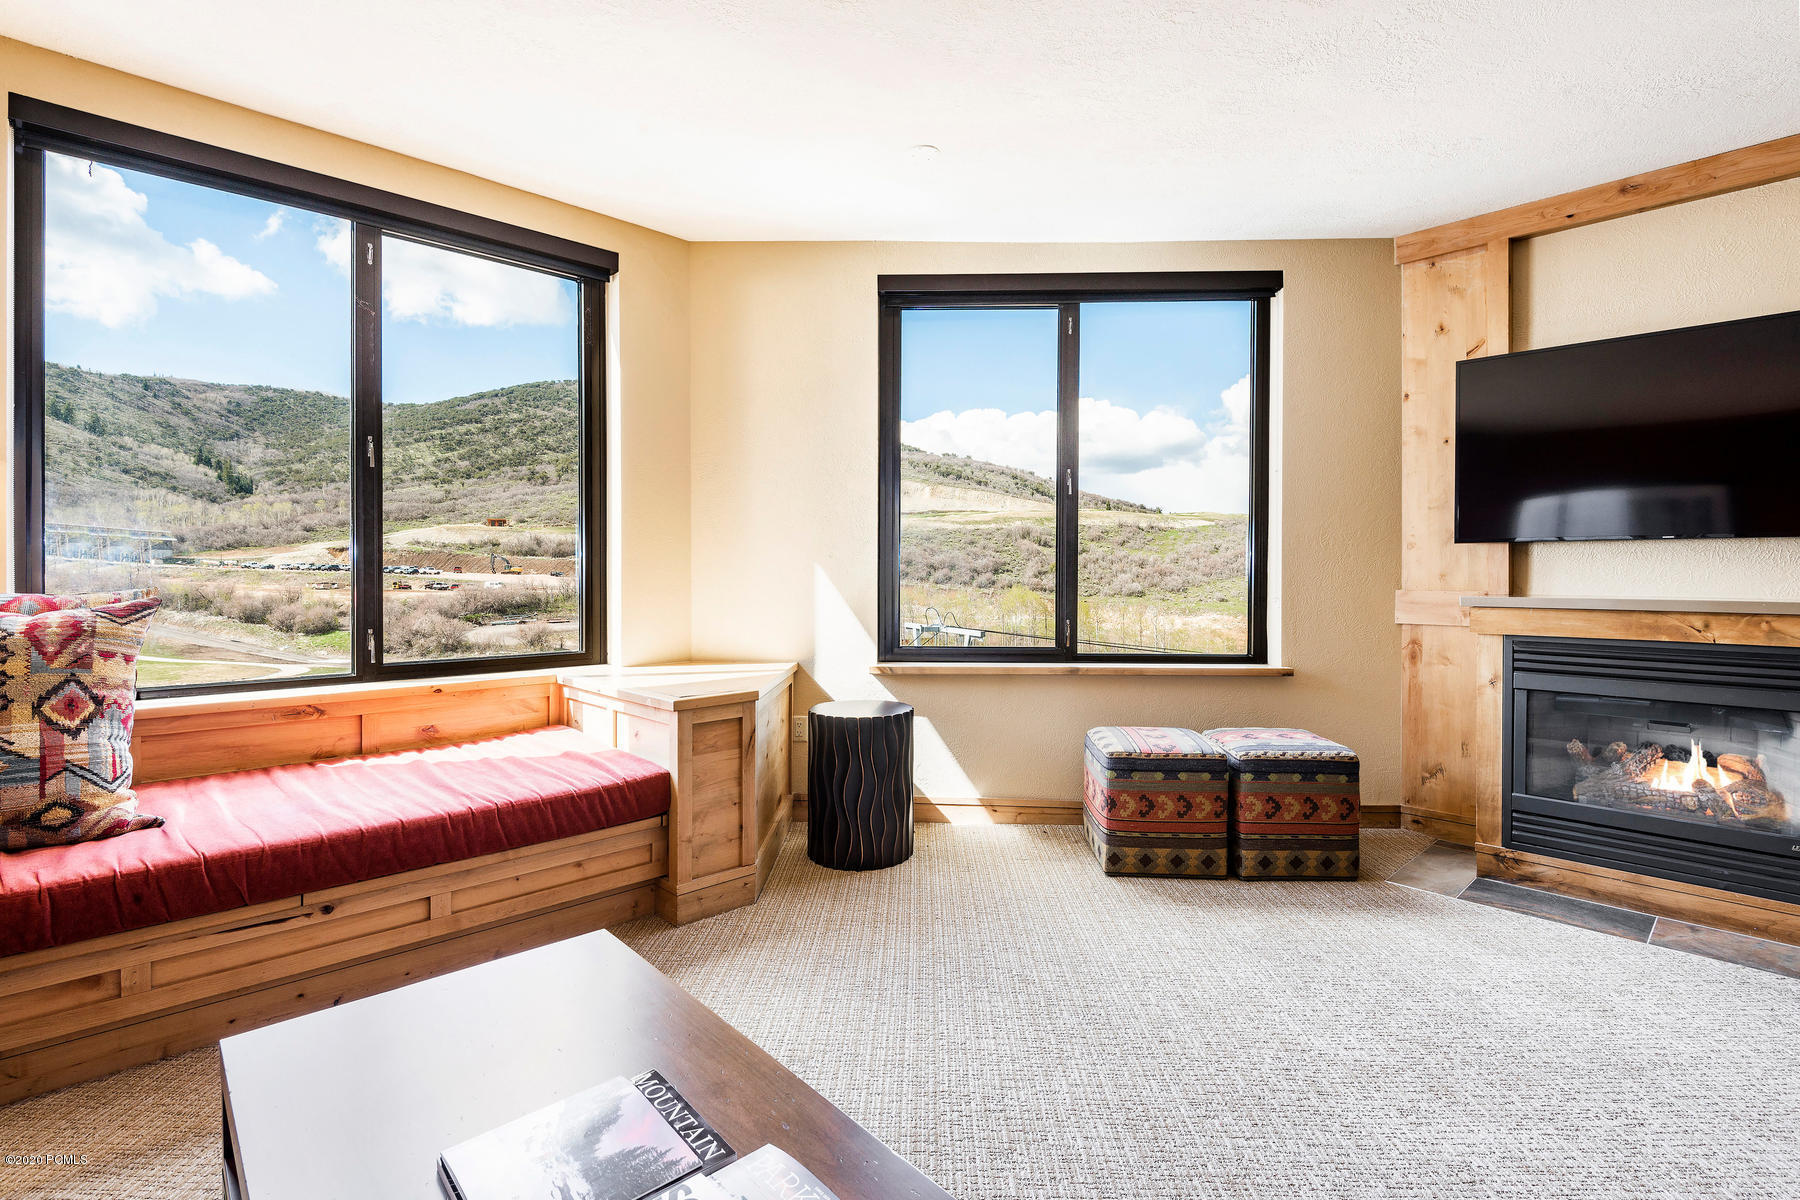 3855 Grand Summit Drive, Park City, Utah 84098, 1 Bedroom Bedrooms, ,1 BathroomBathrooms,Condominium,For Sale,Grand Summit,12002293